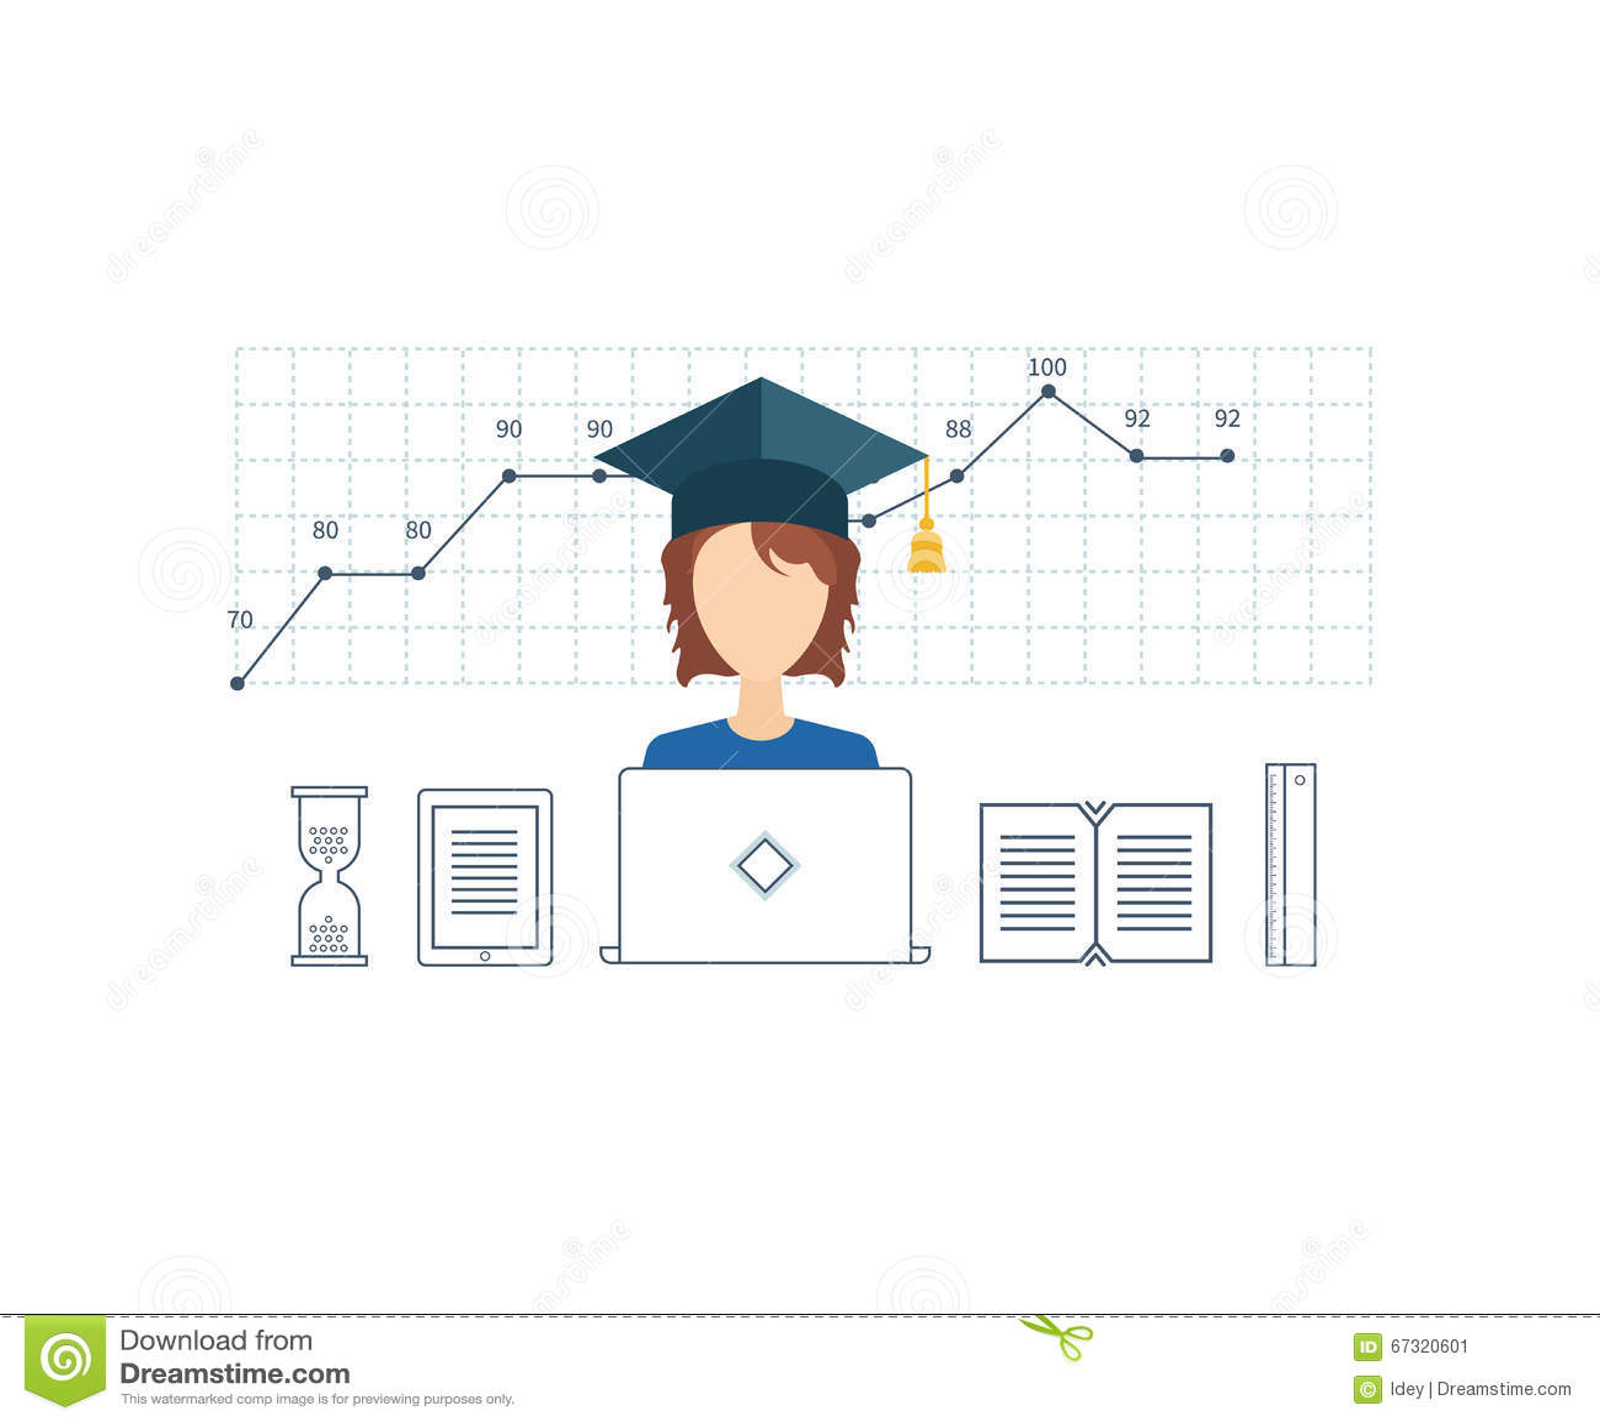 Strategic Management Process MCQs - mcqslearn.com